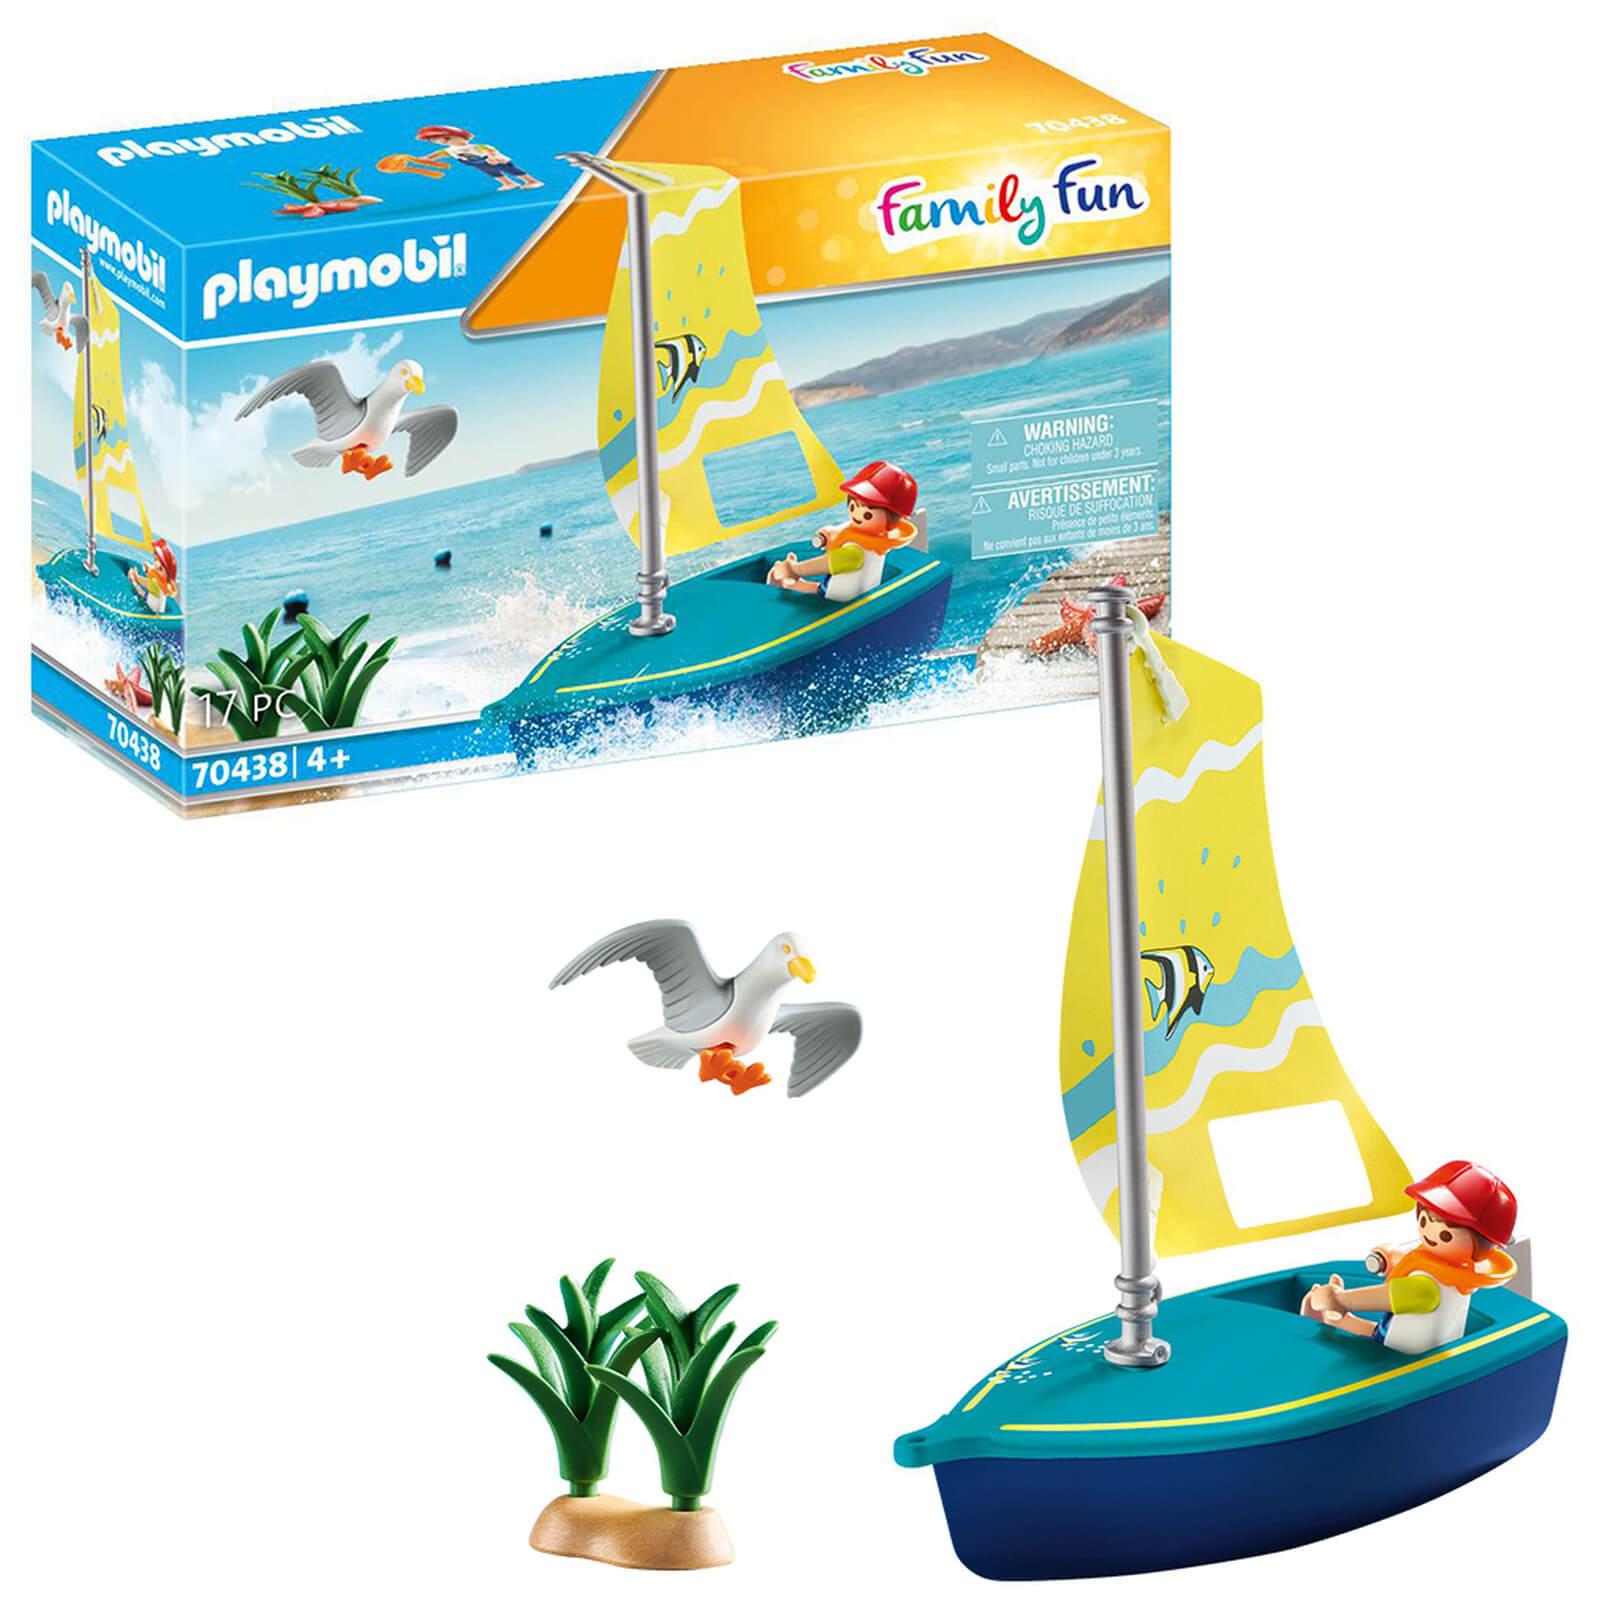 Playmobil Family Fun Beach Hotel Sailboat (70438)